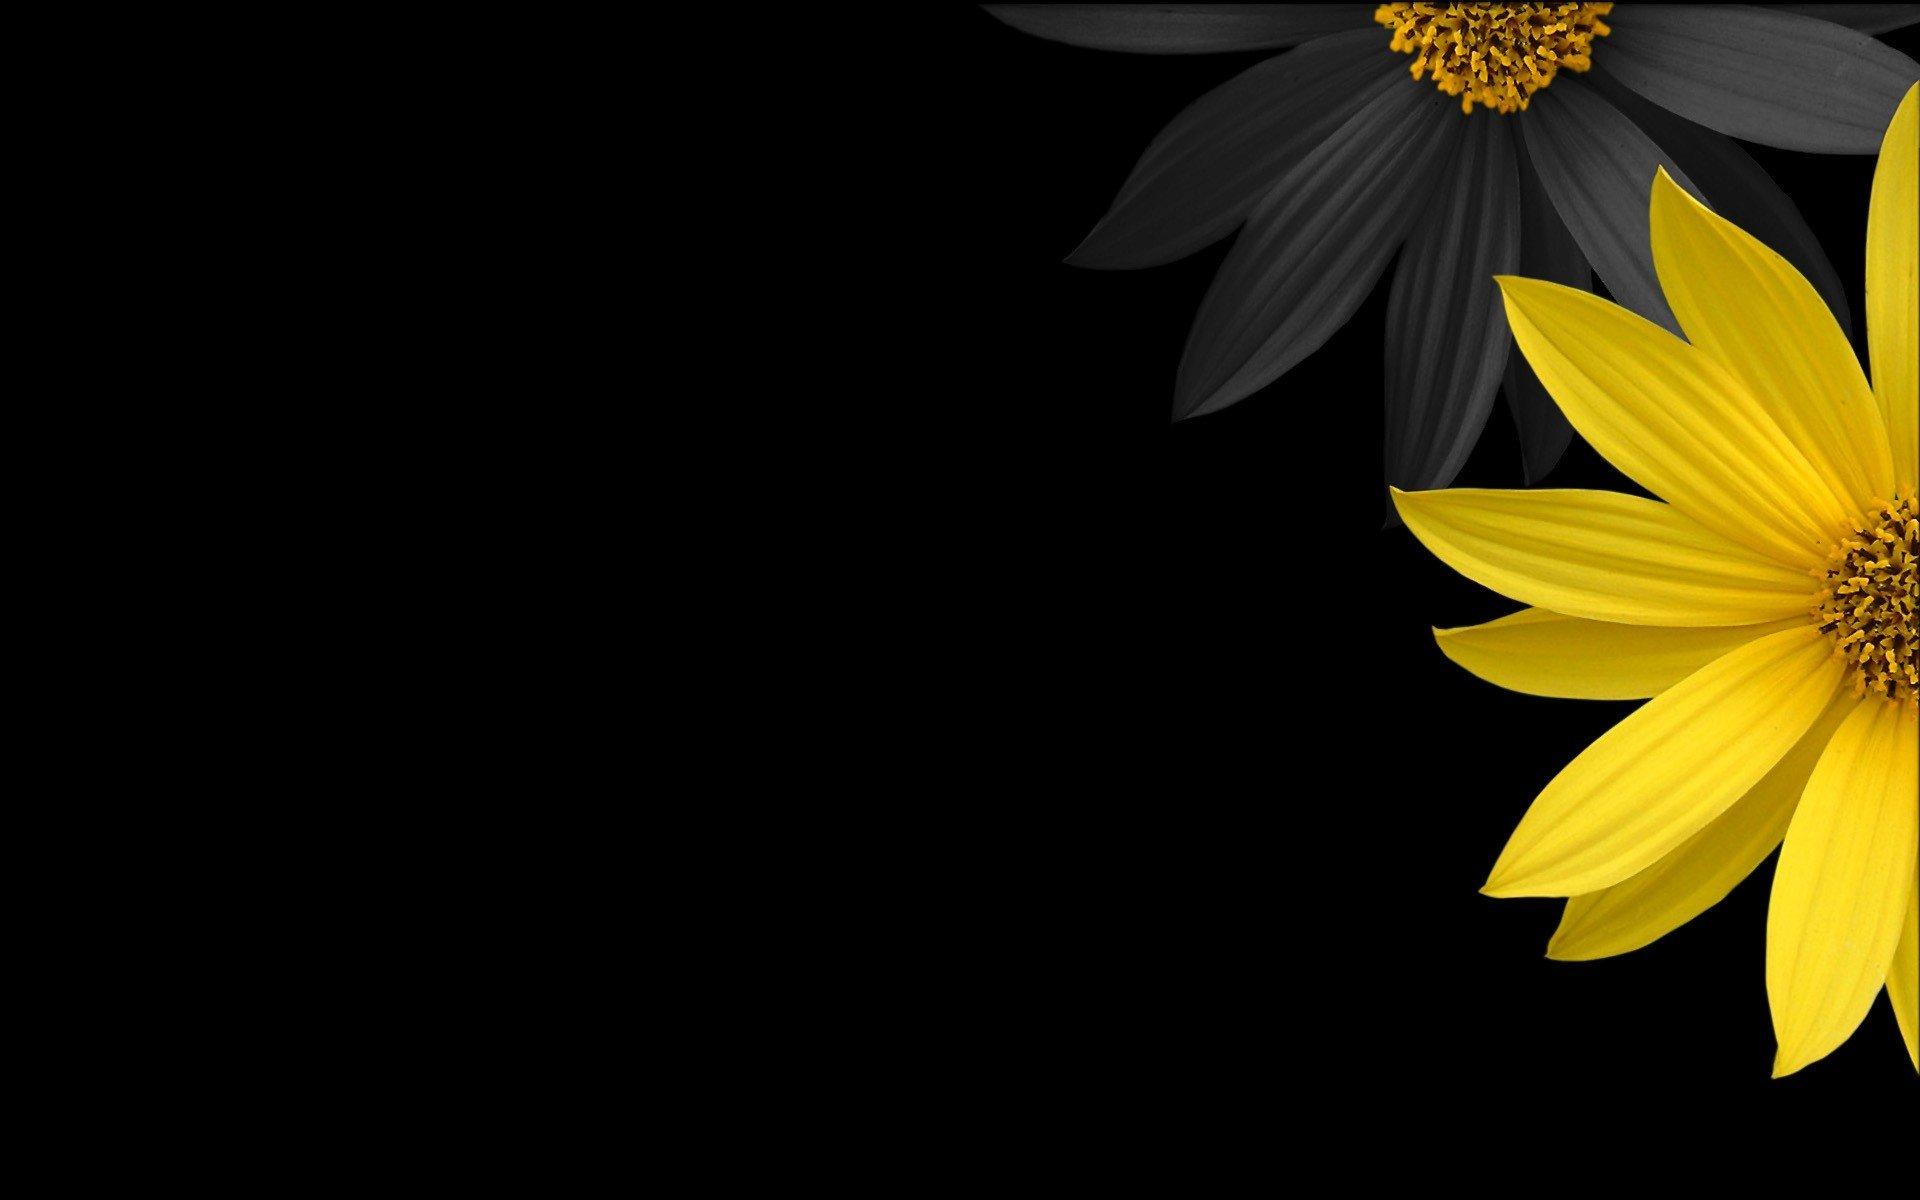 Black minimalistic yellow flower petals black background - Flower wallpaper black ...